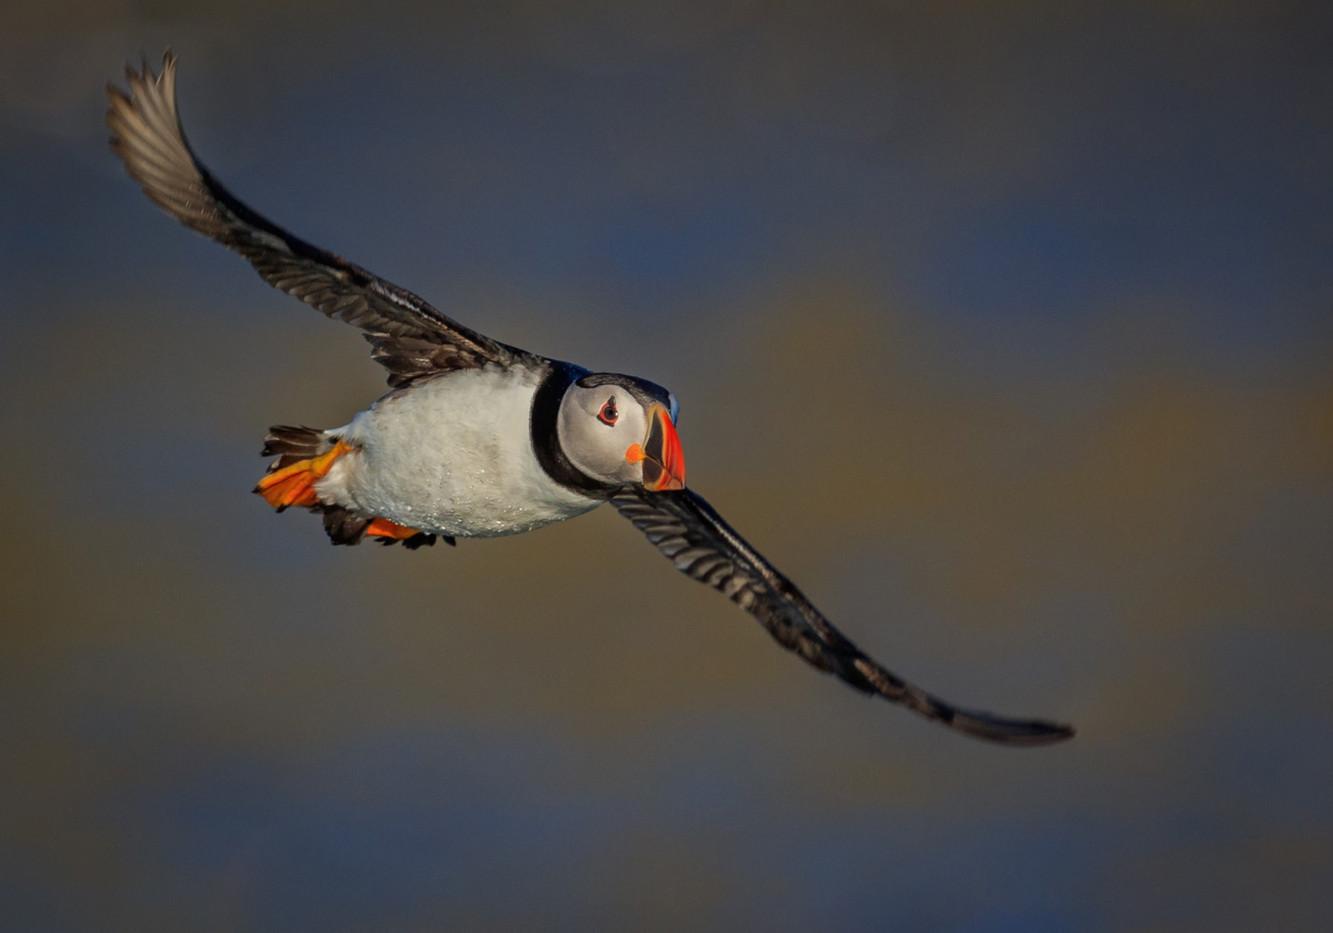 20 PUFFIN IN FLIGHT AT LAST LIGHT by David Godfrey